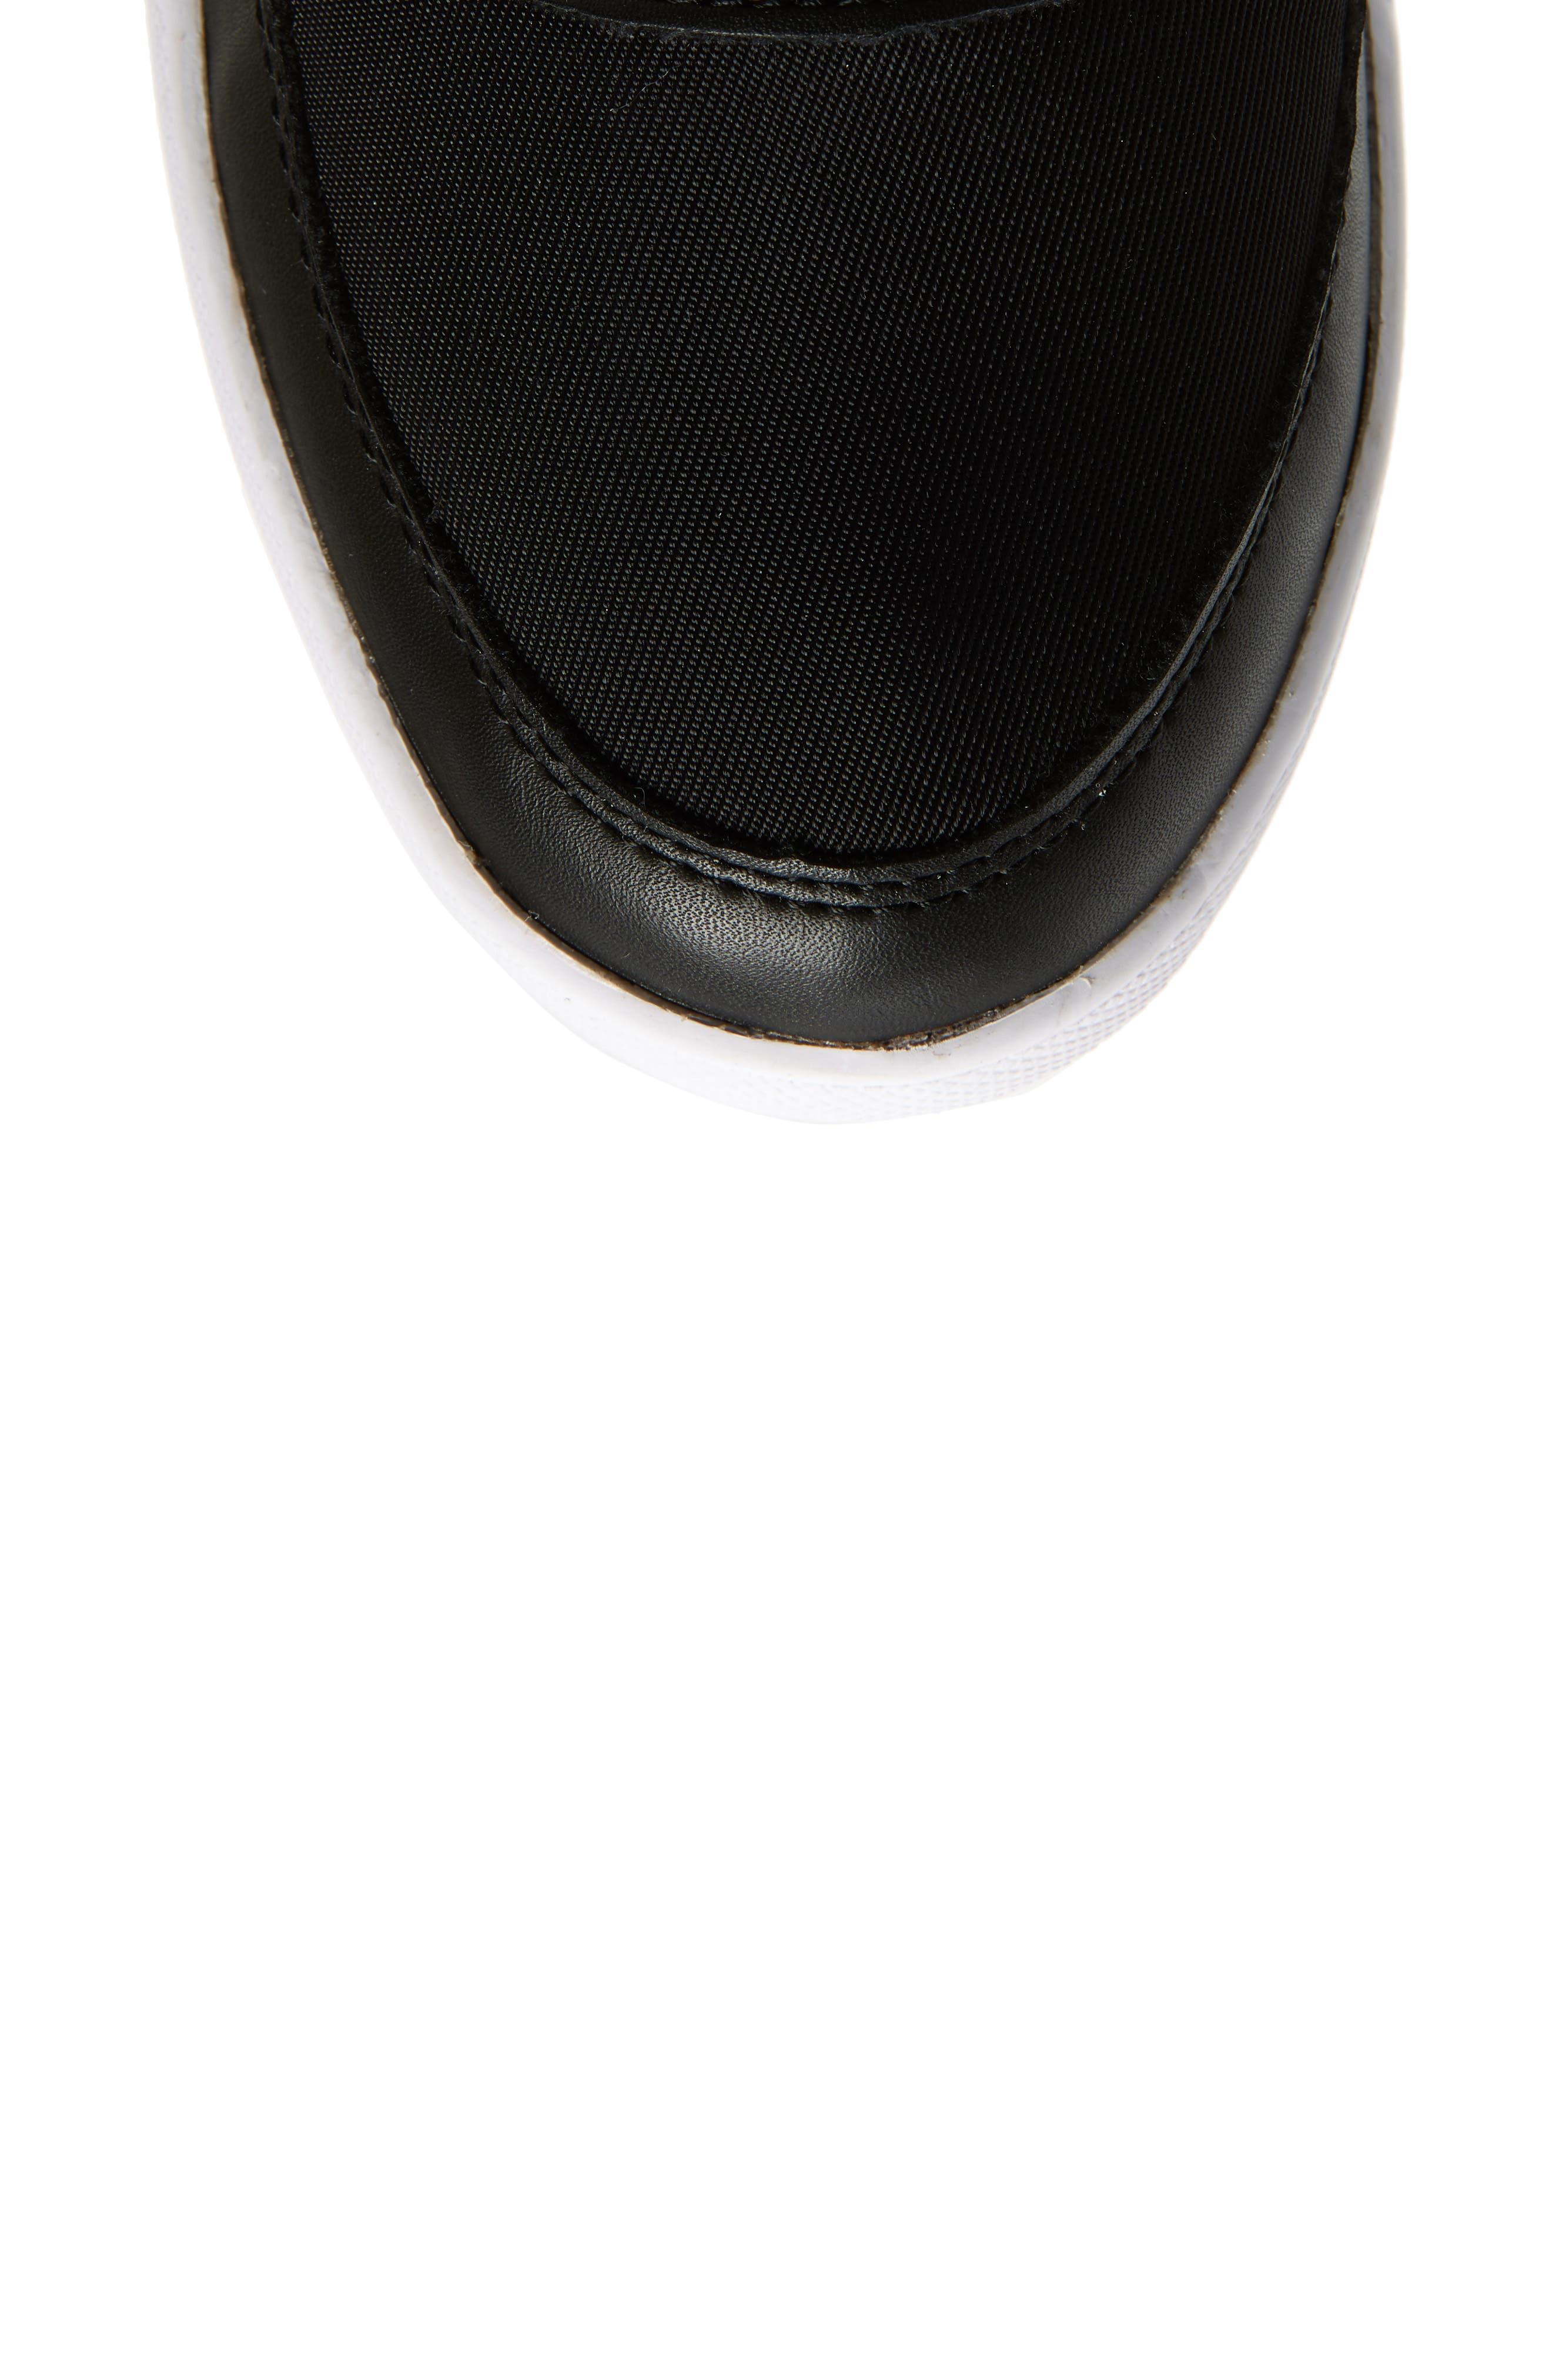 COUGAR, Vesta Faux Fur Collar Knee High Snow Boot, Alternate thumbnail 5, color, BLACK FABRIC